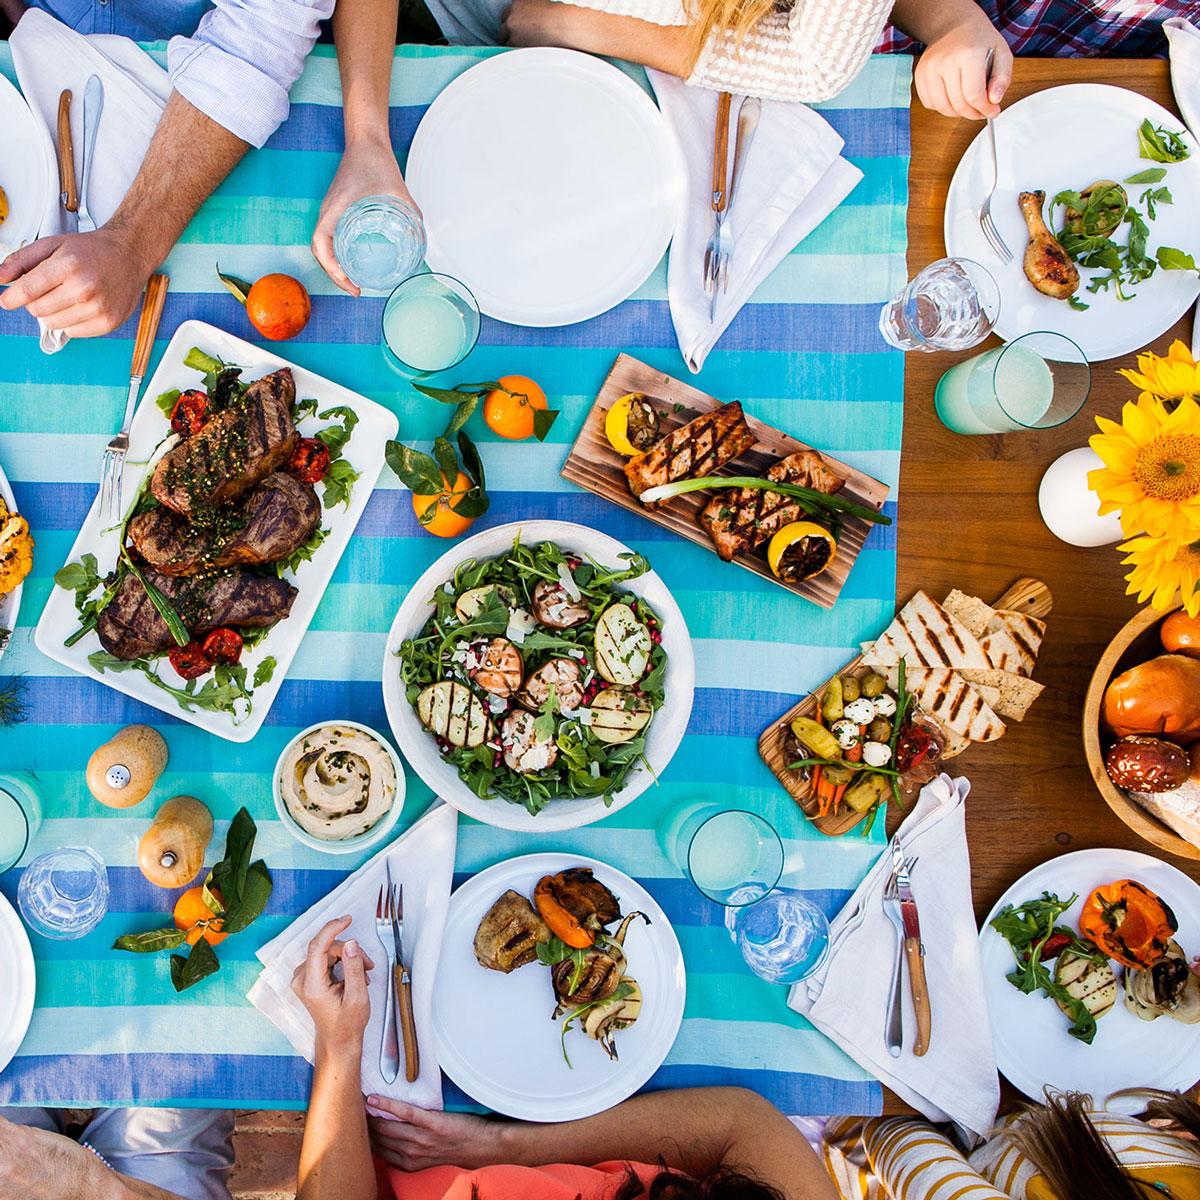 Food Tastes better Outdoors!